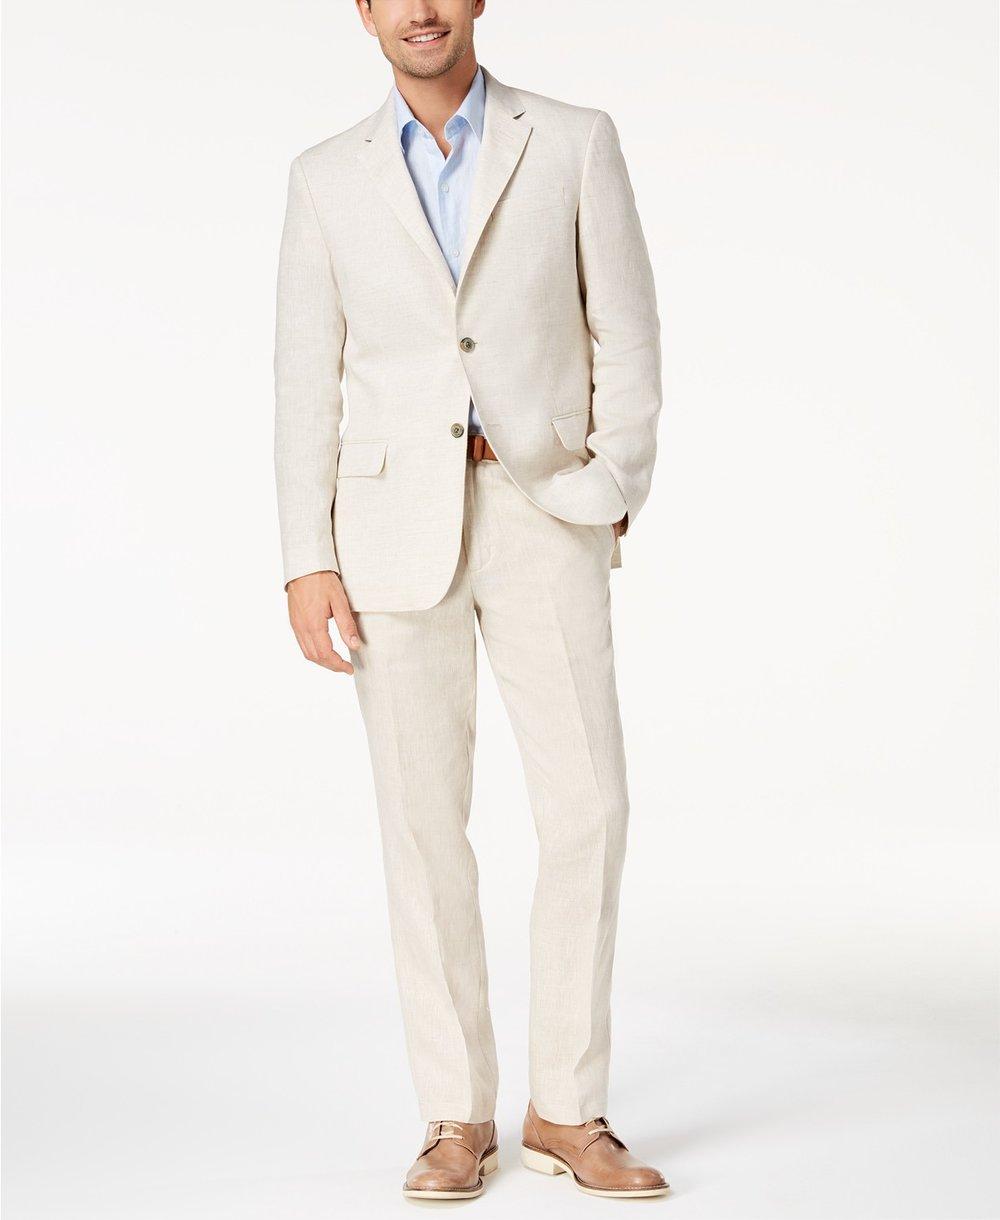 Men's 100% Linen 2 Button Blazer, $79.99, Tasso Elba created for  Macy's